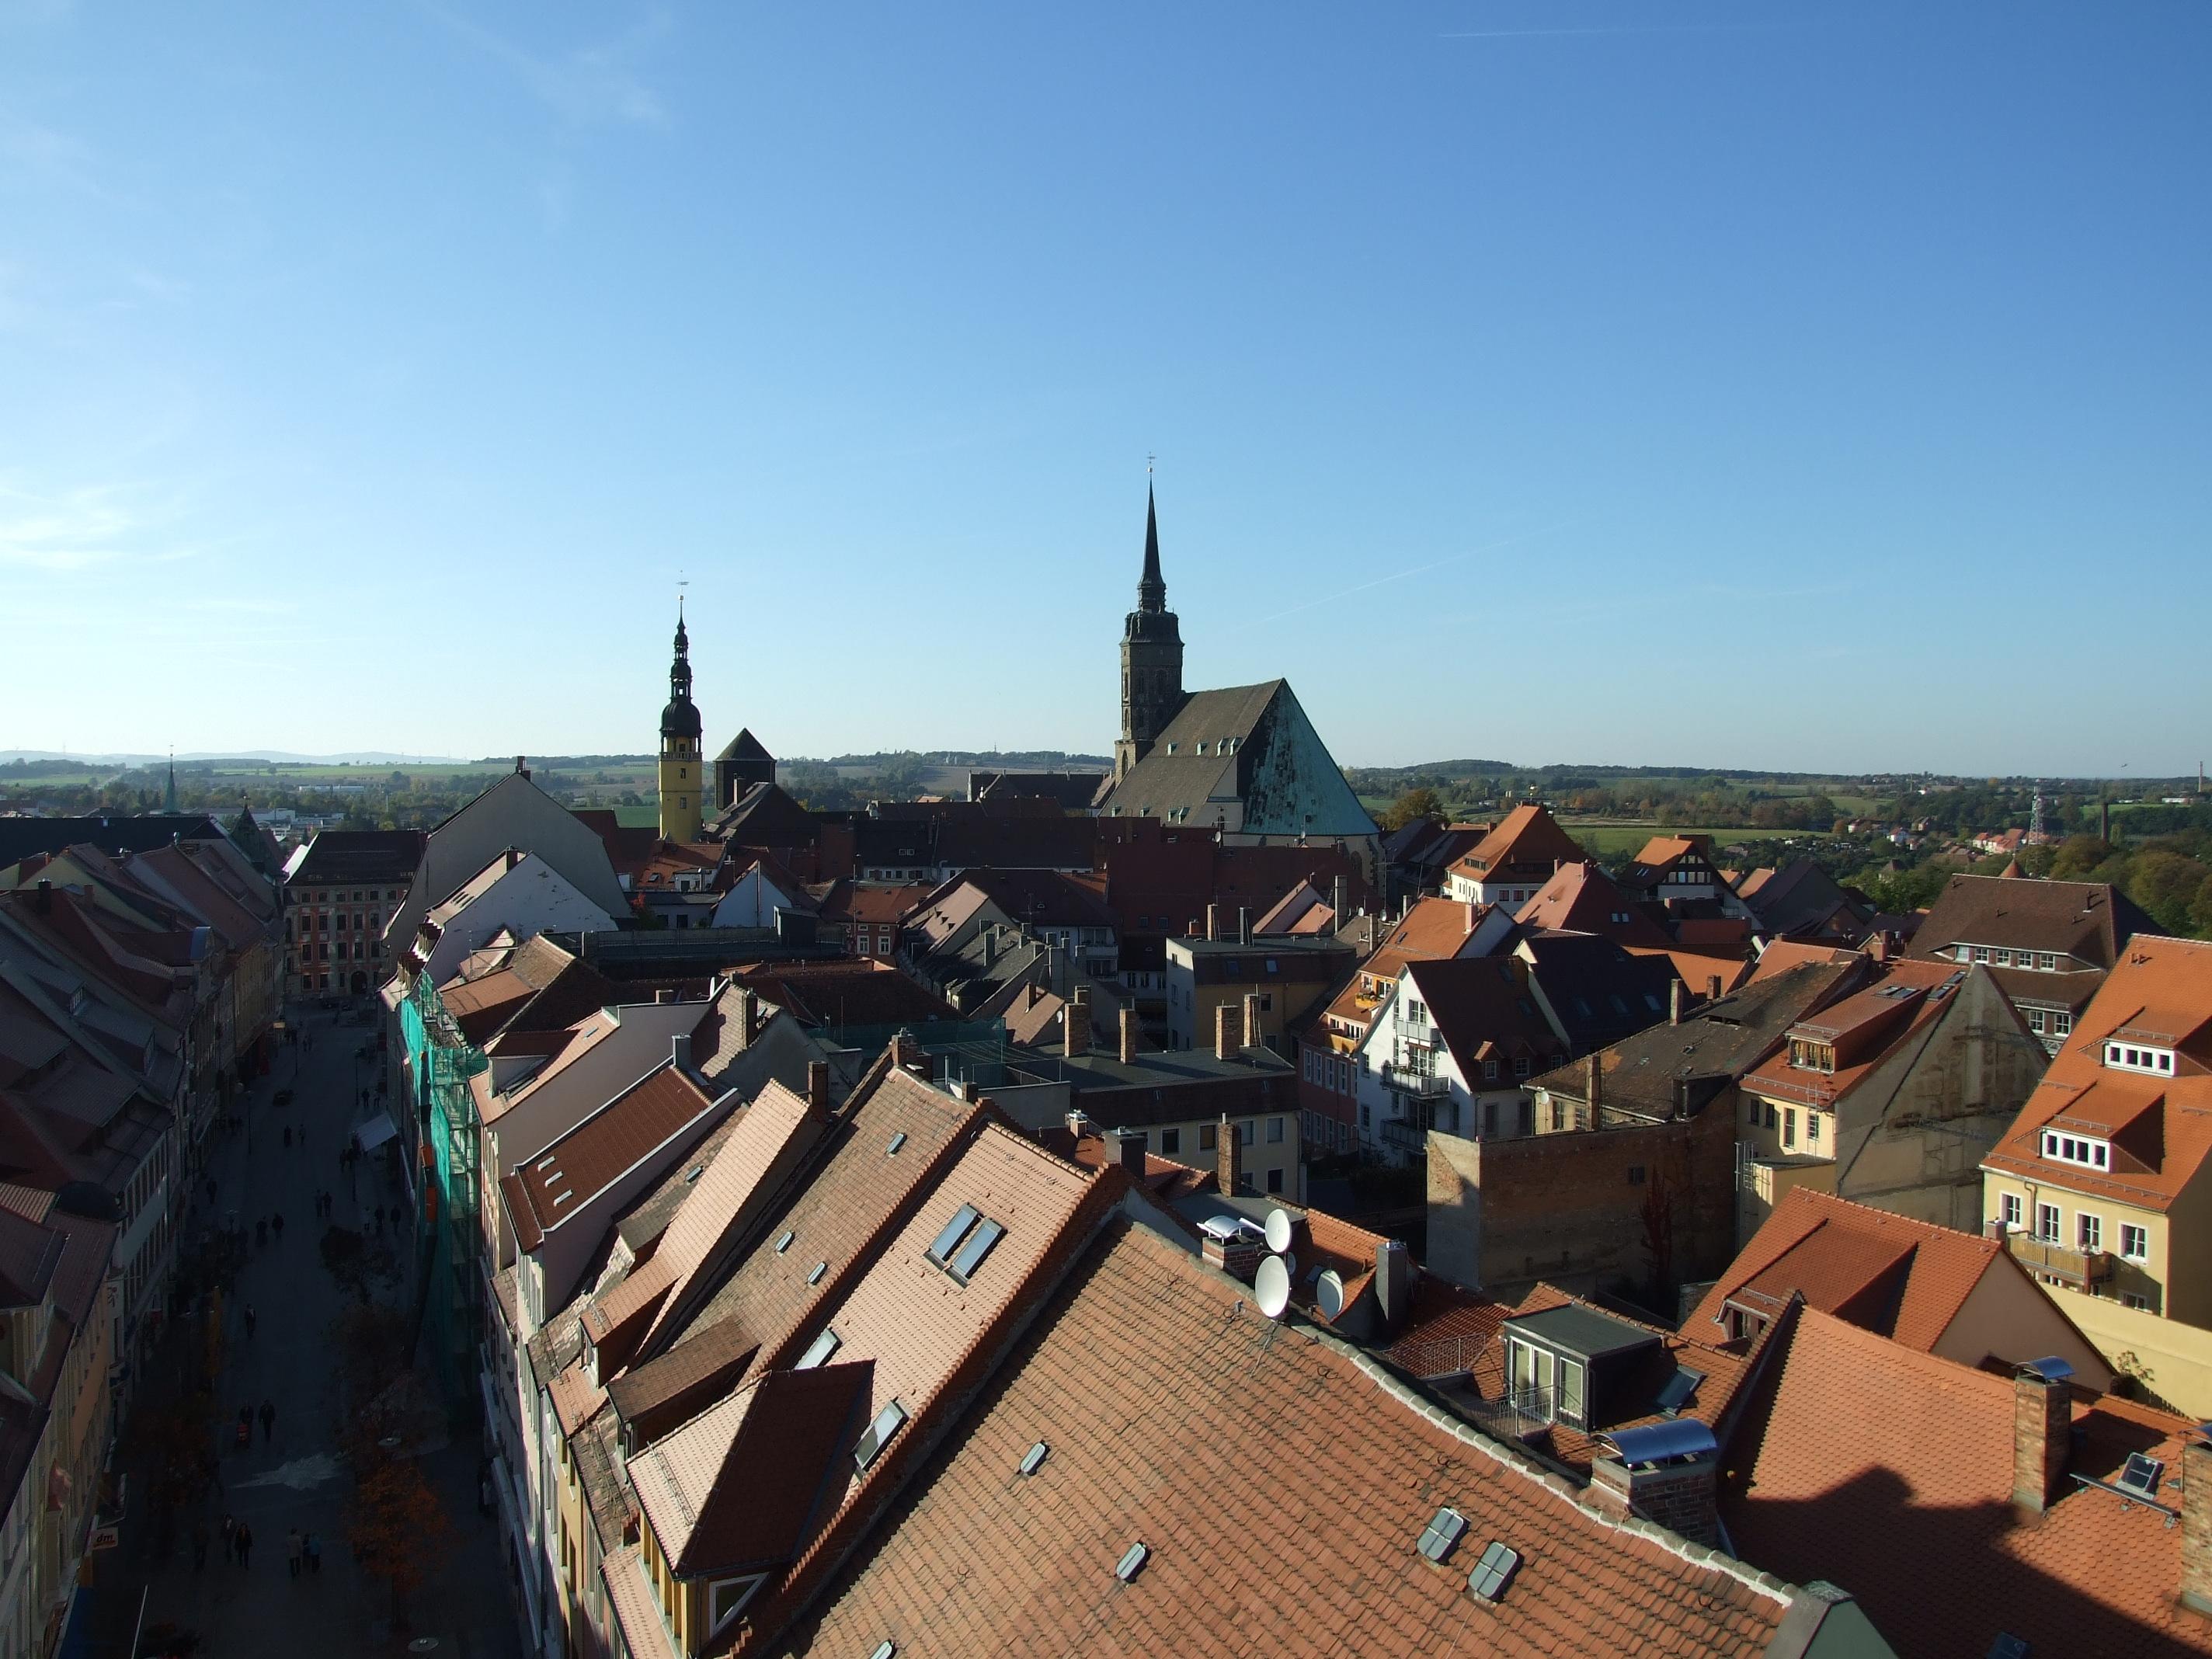 Altstadt Bautzen mit Dom St. Petri